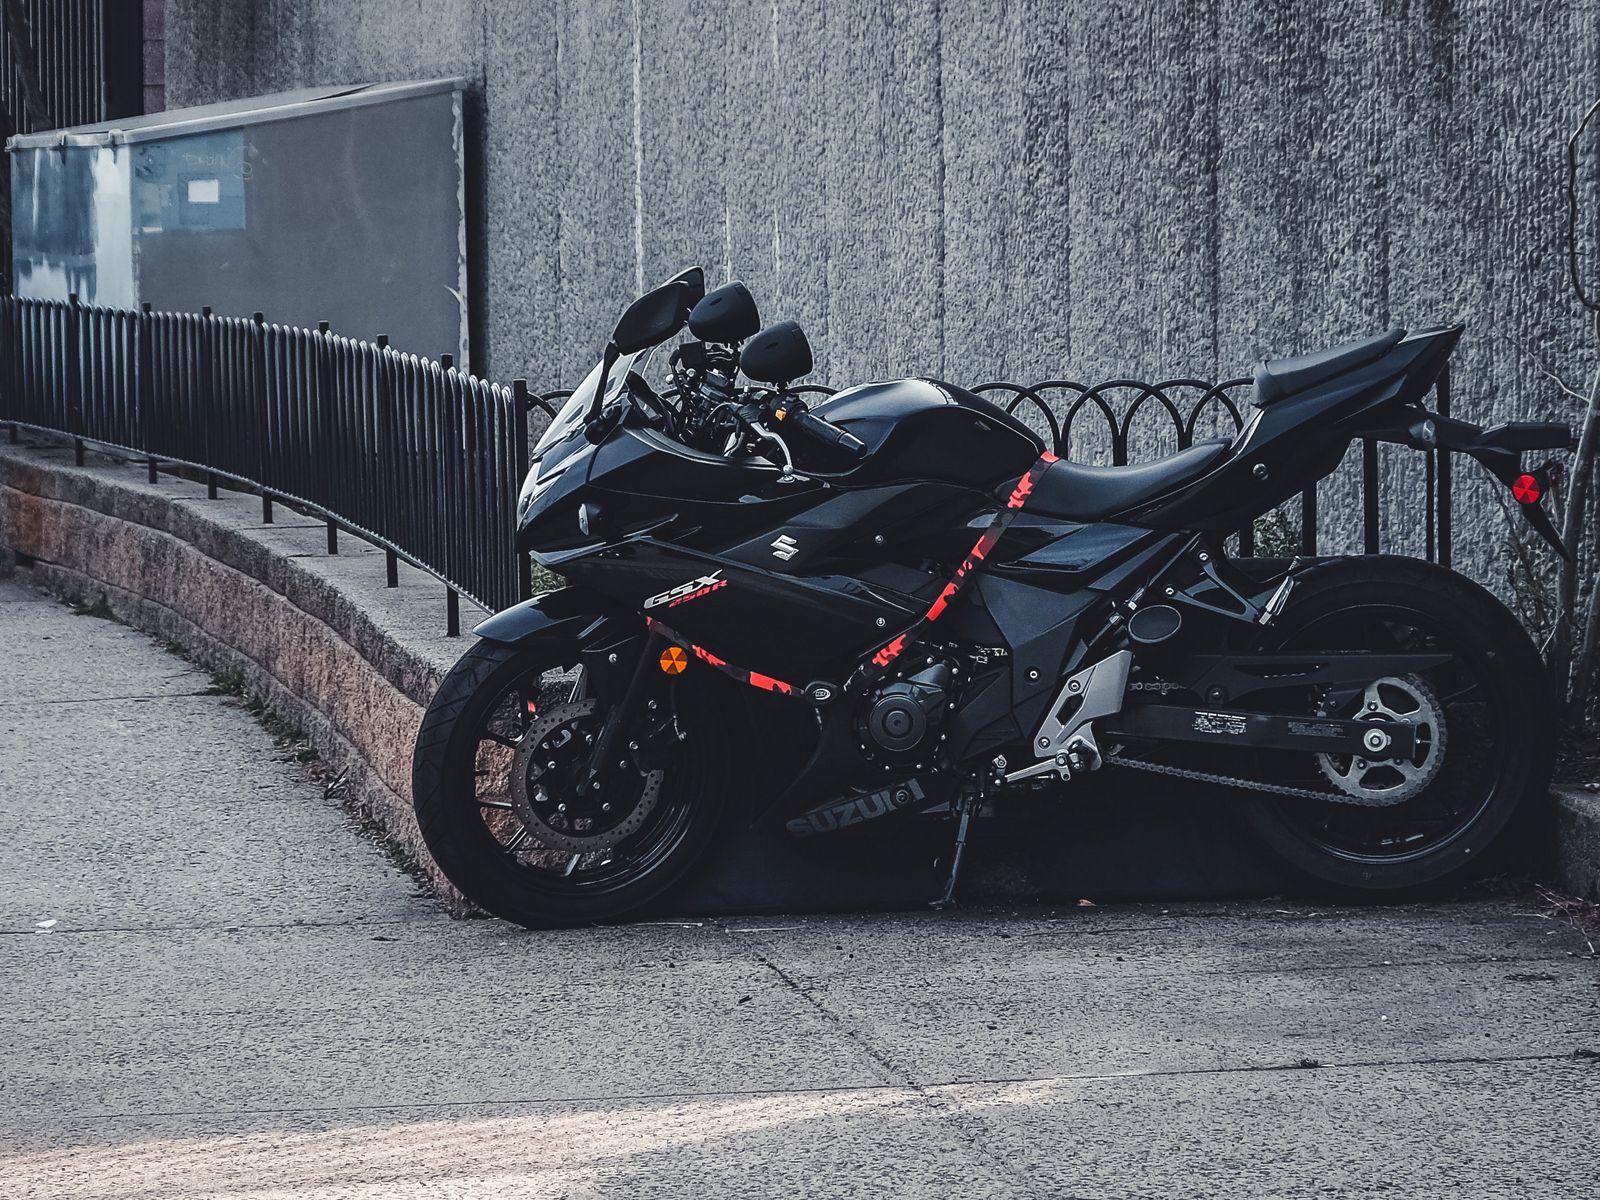 1600x1200 Wallpaper suzuki, motorcycle, bike, black, parking